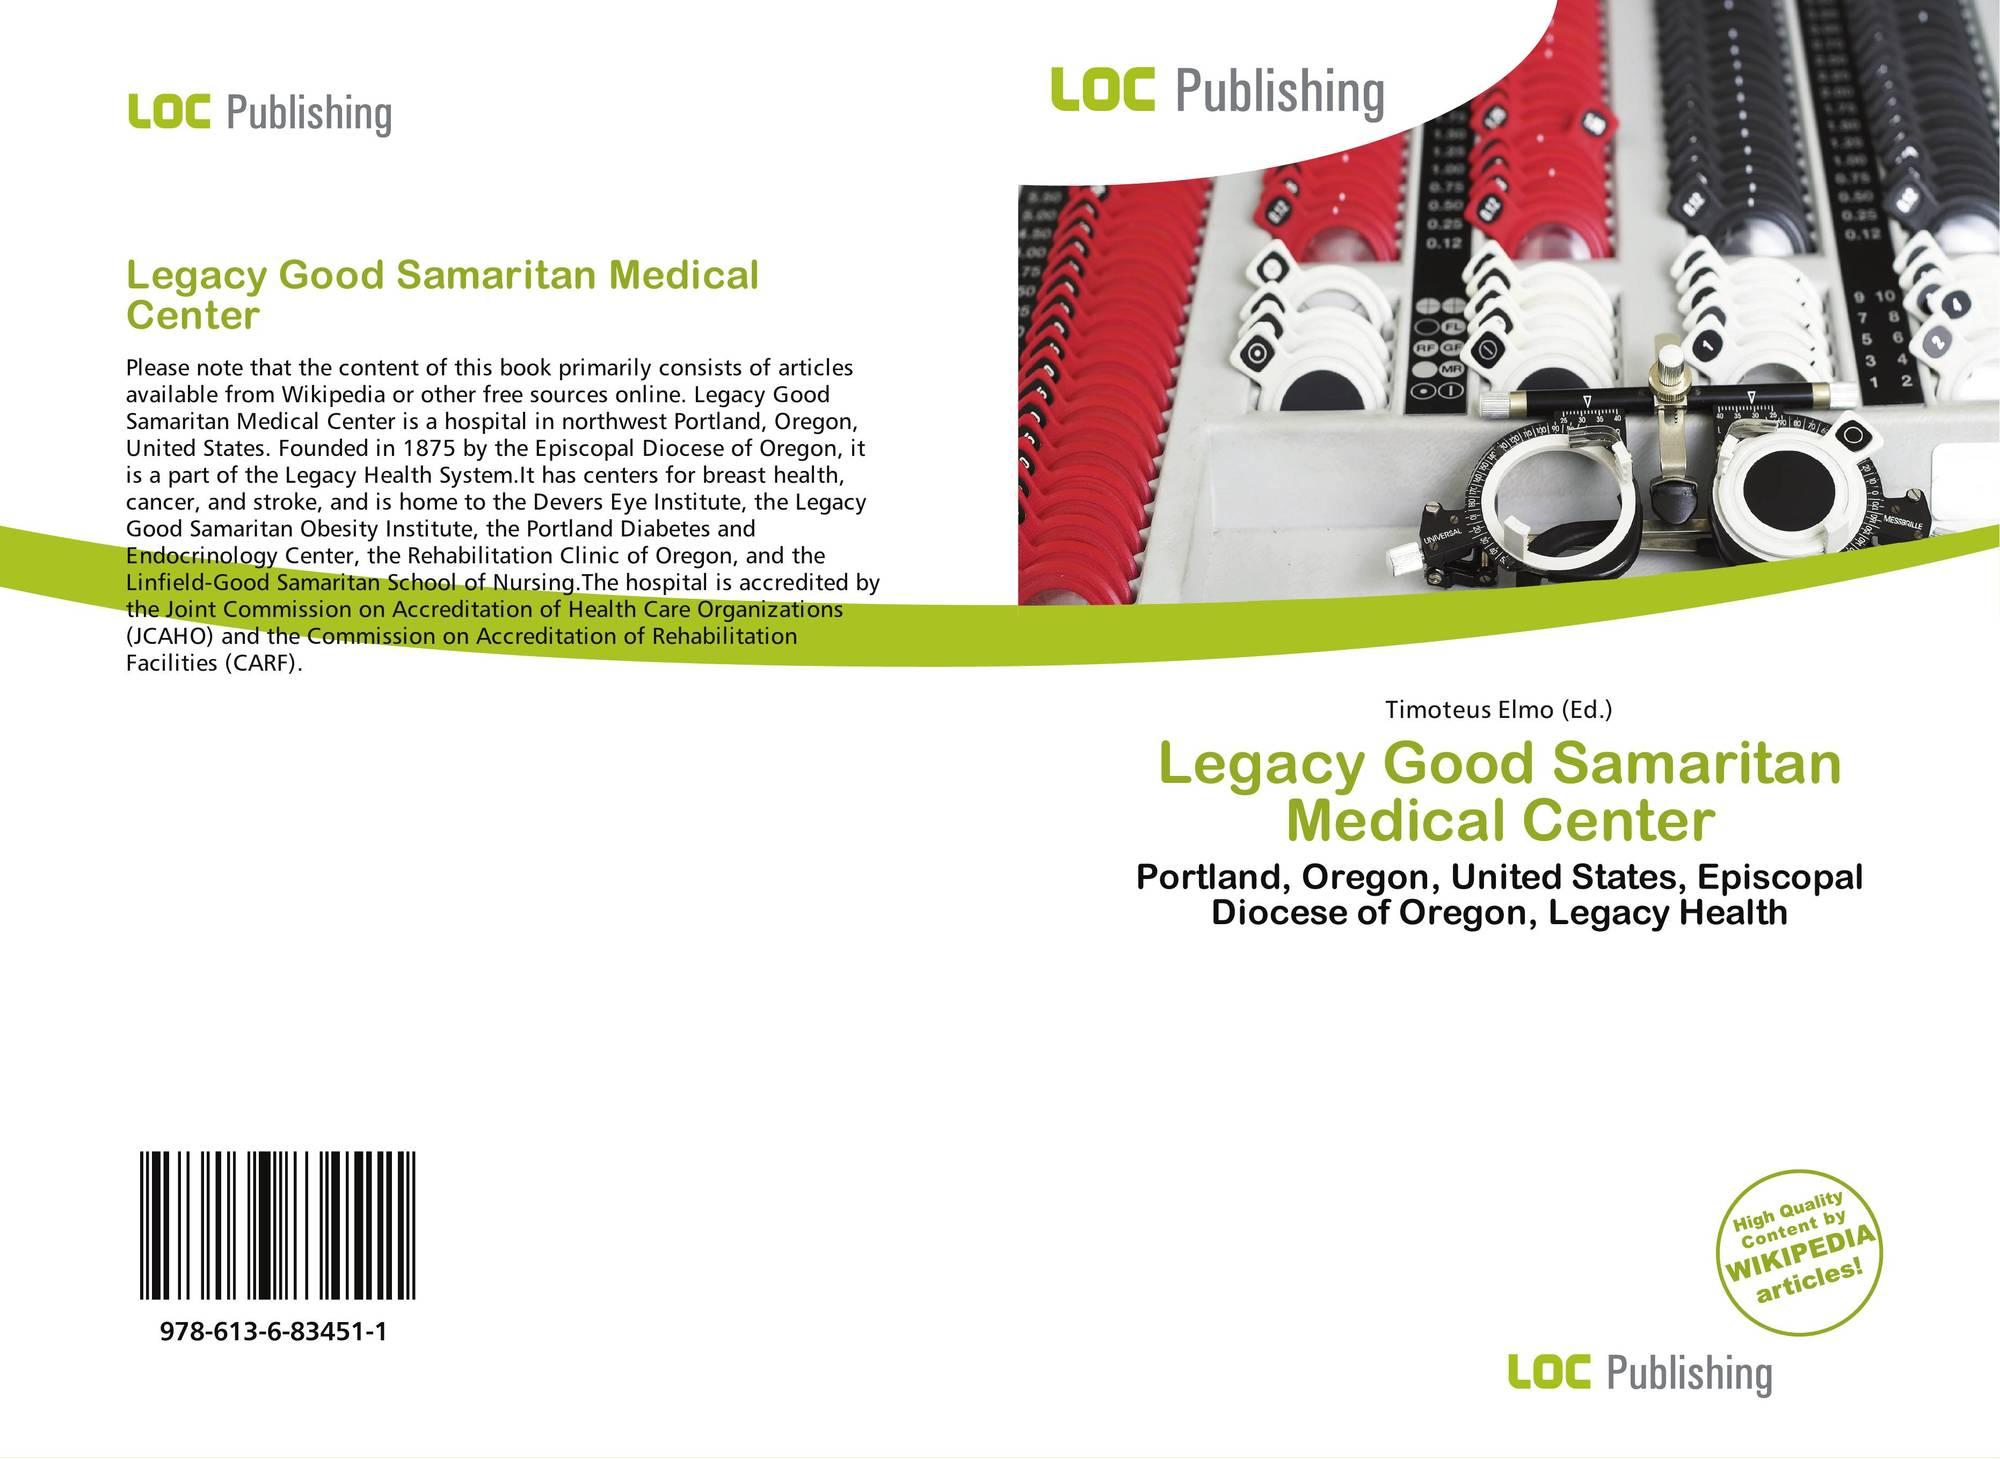 Legacy Good Samaritan Medical Center, 978-613-6-83451-1